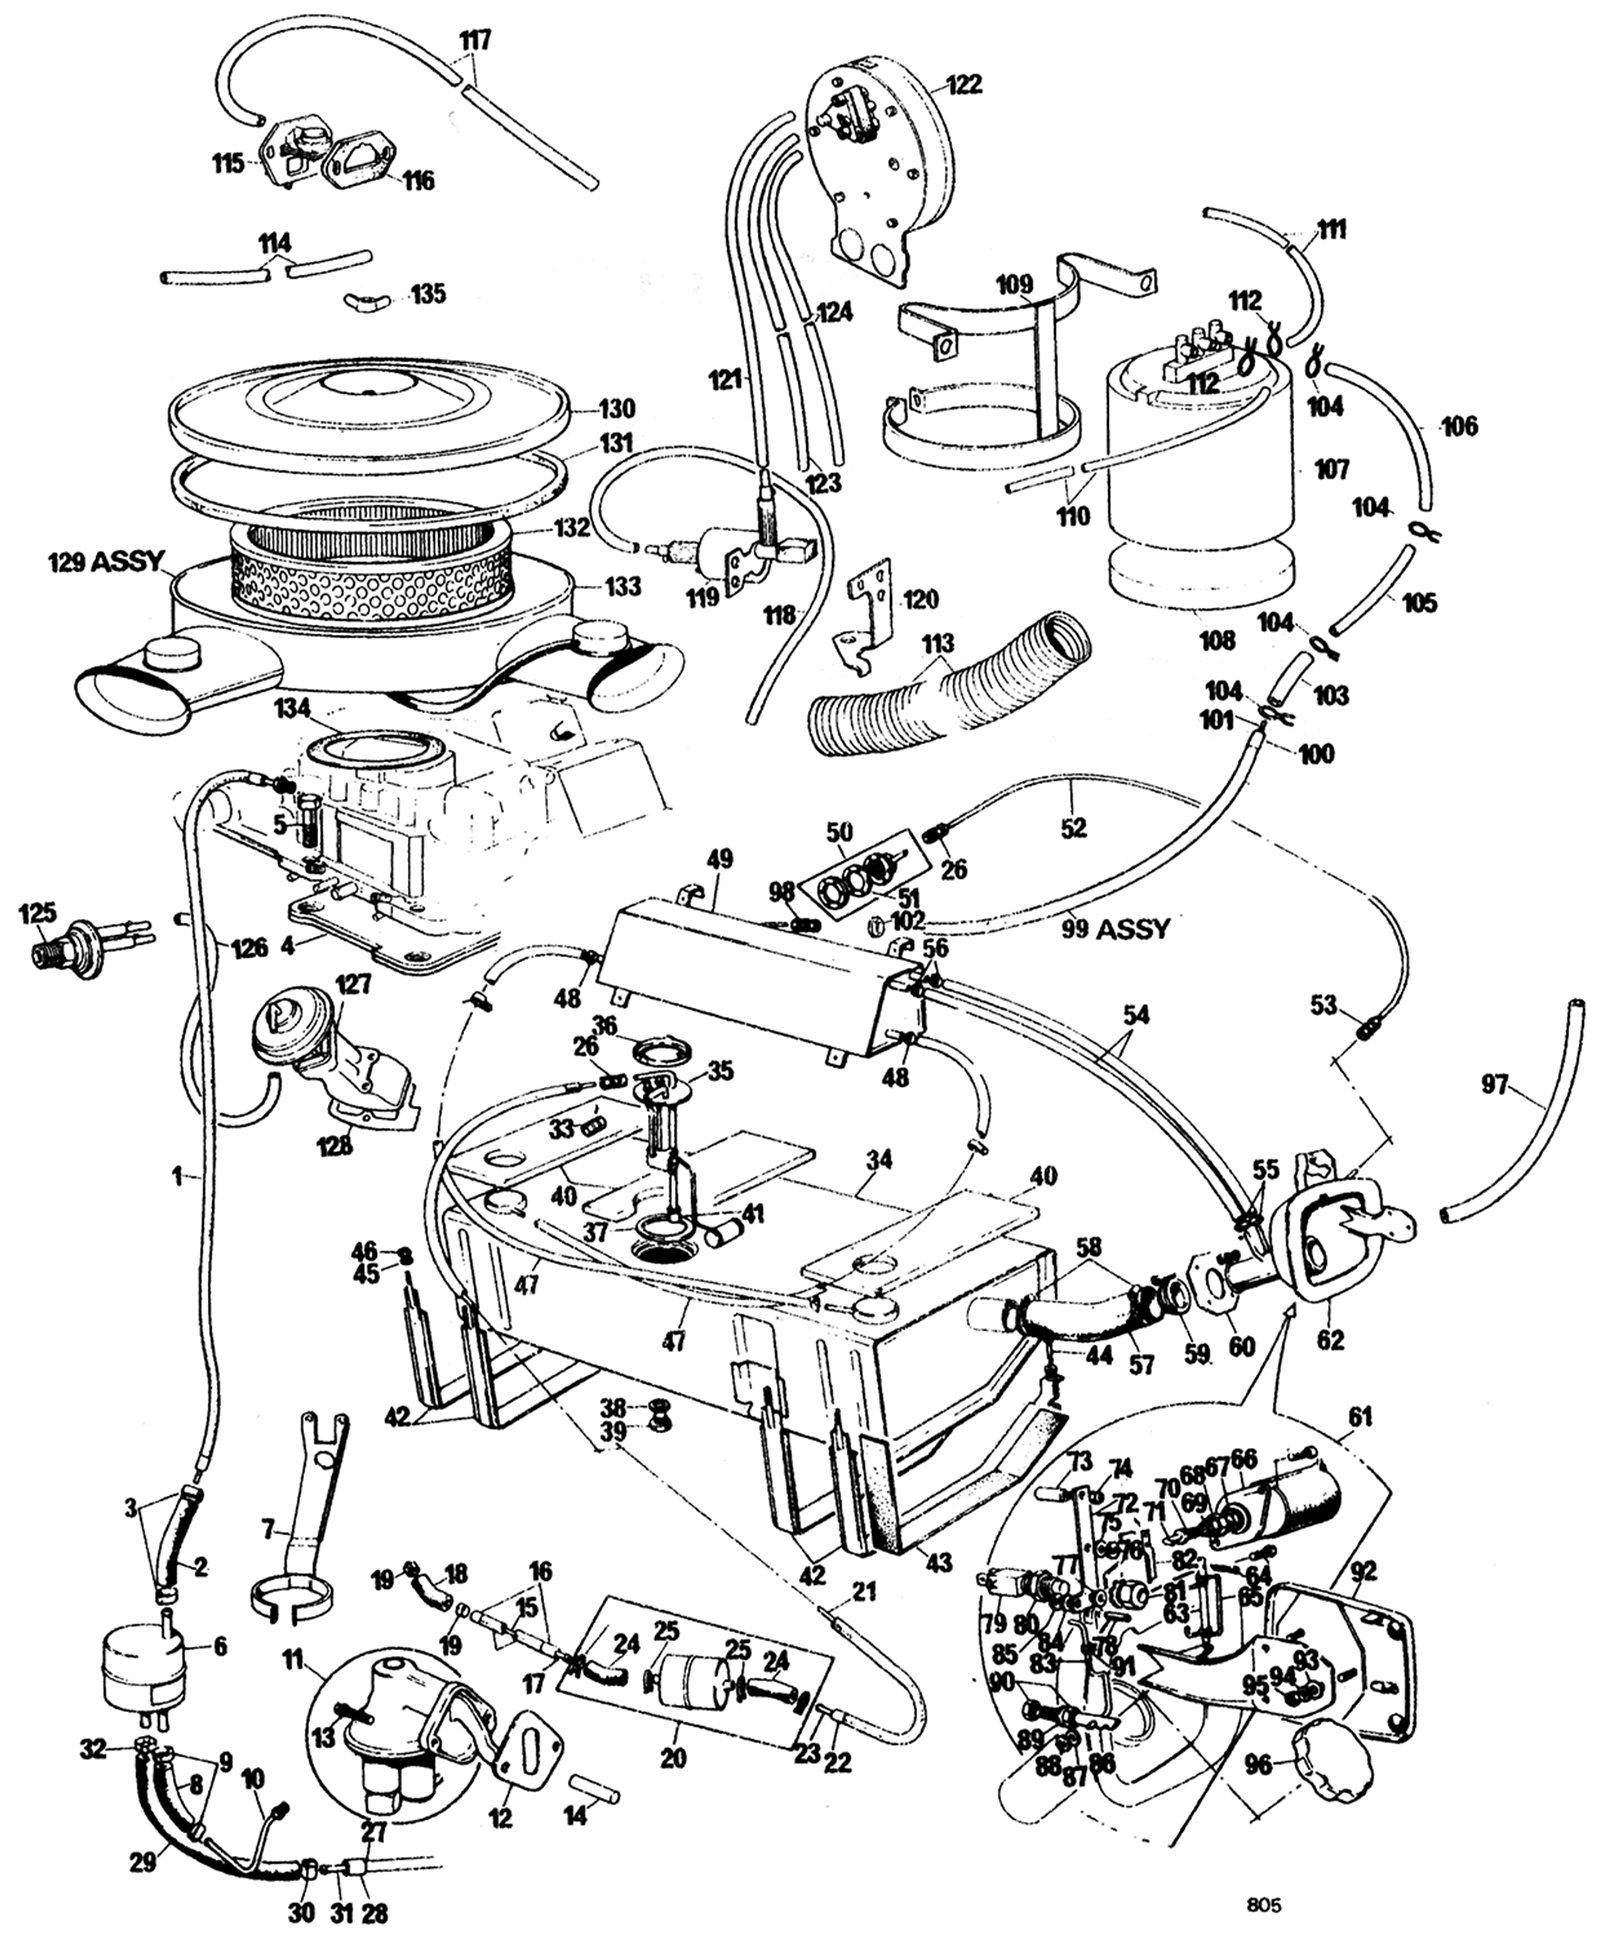 hight resolution of fuel pump two push on airtex martin robey airtex fuel pump auto parts diagrams